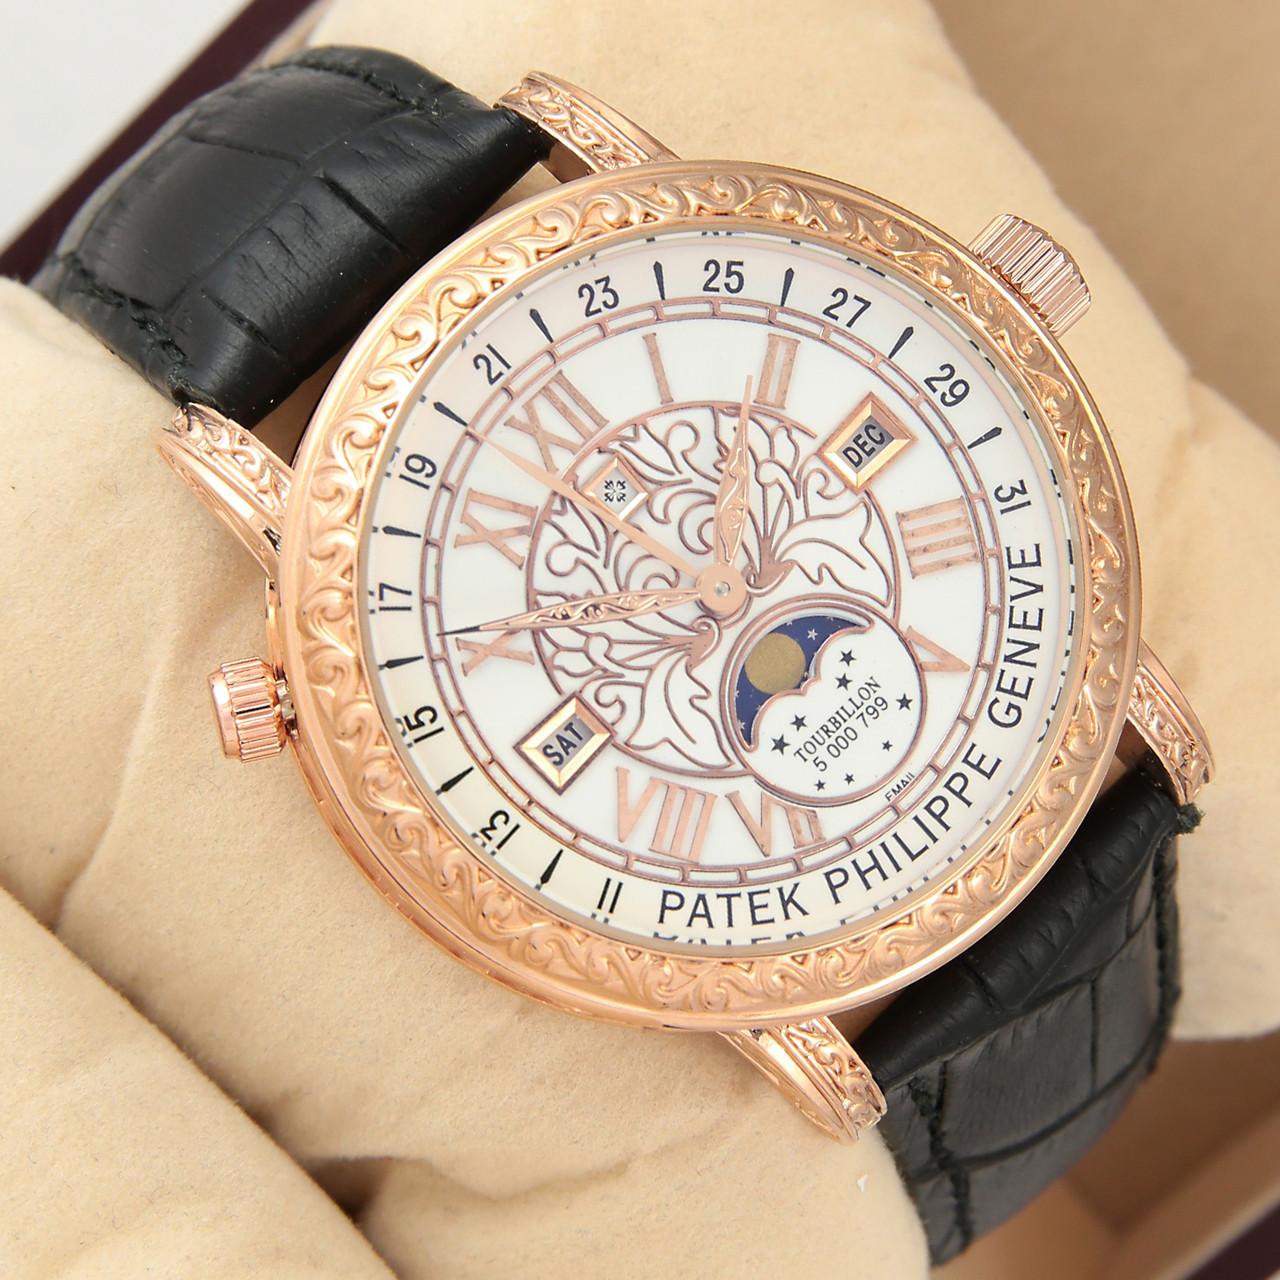 338a2c9d Астрономические часы Patek Philippe Grand Complications 6002 Sky Moon  Tourbillon - цвет золото с белым